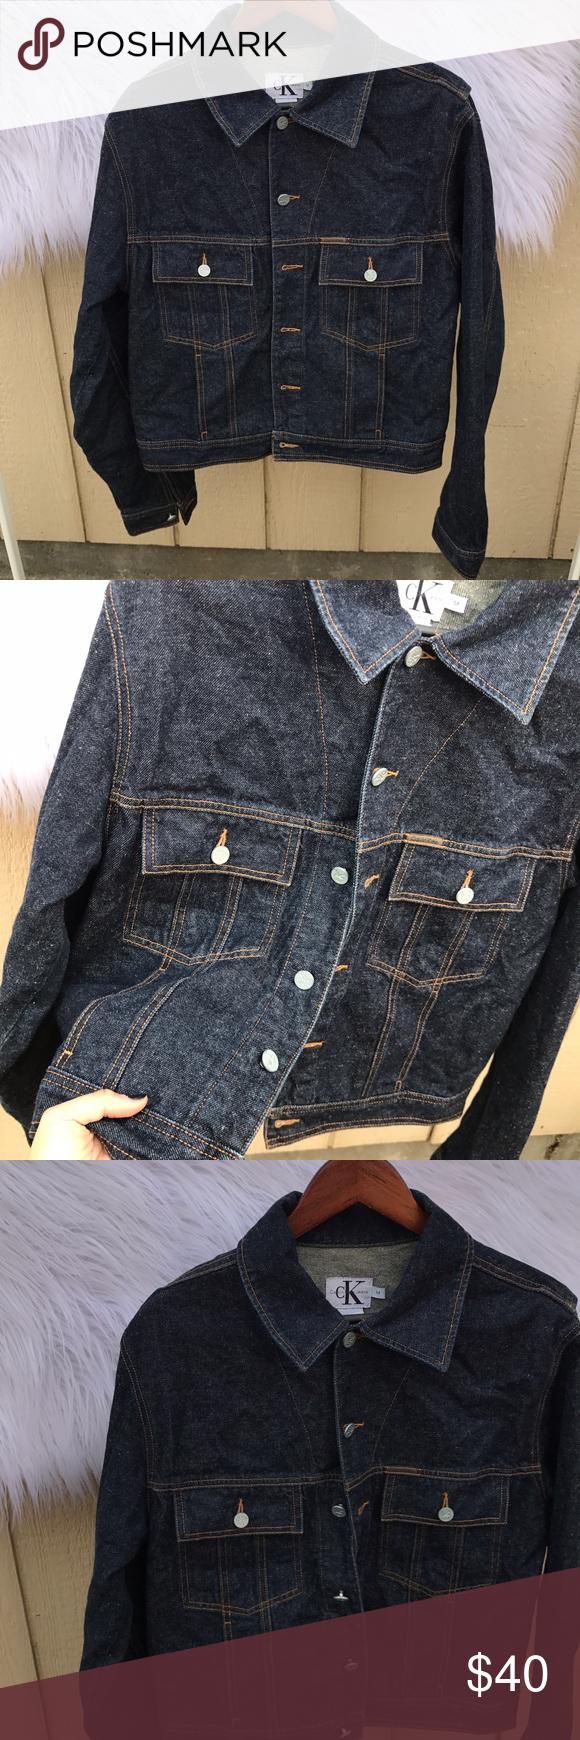 CALVIN KLEIN SZ M DENIM JACKET SUPER CUTE Almost new :) Calvin Klein Jackets & Coats